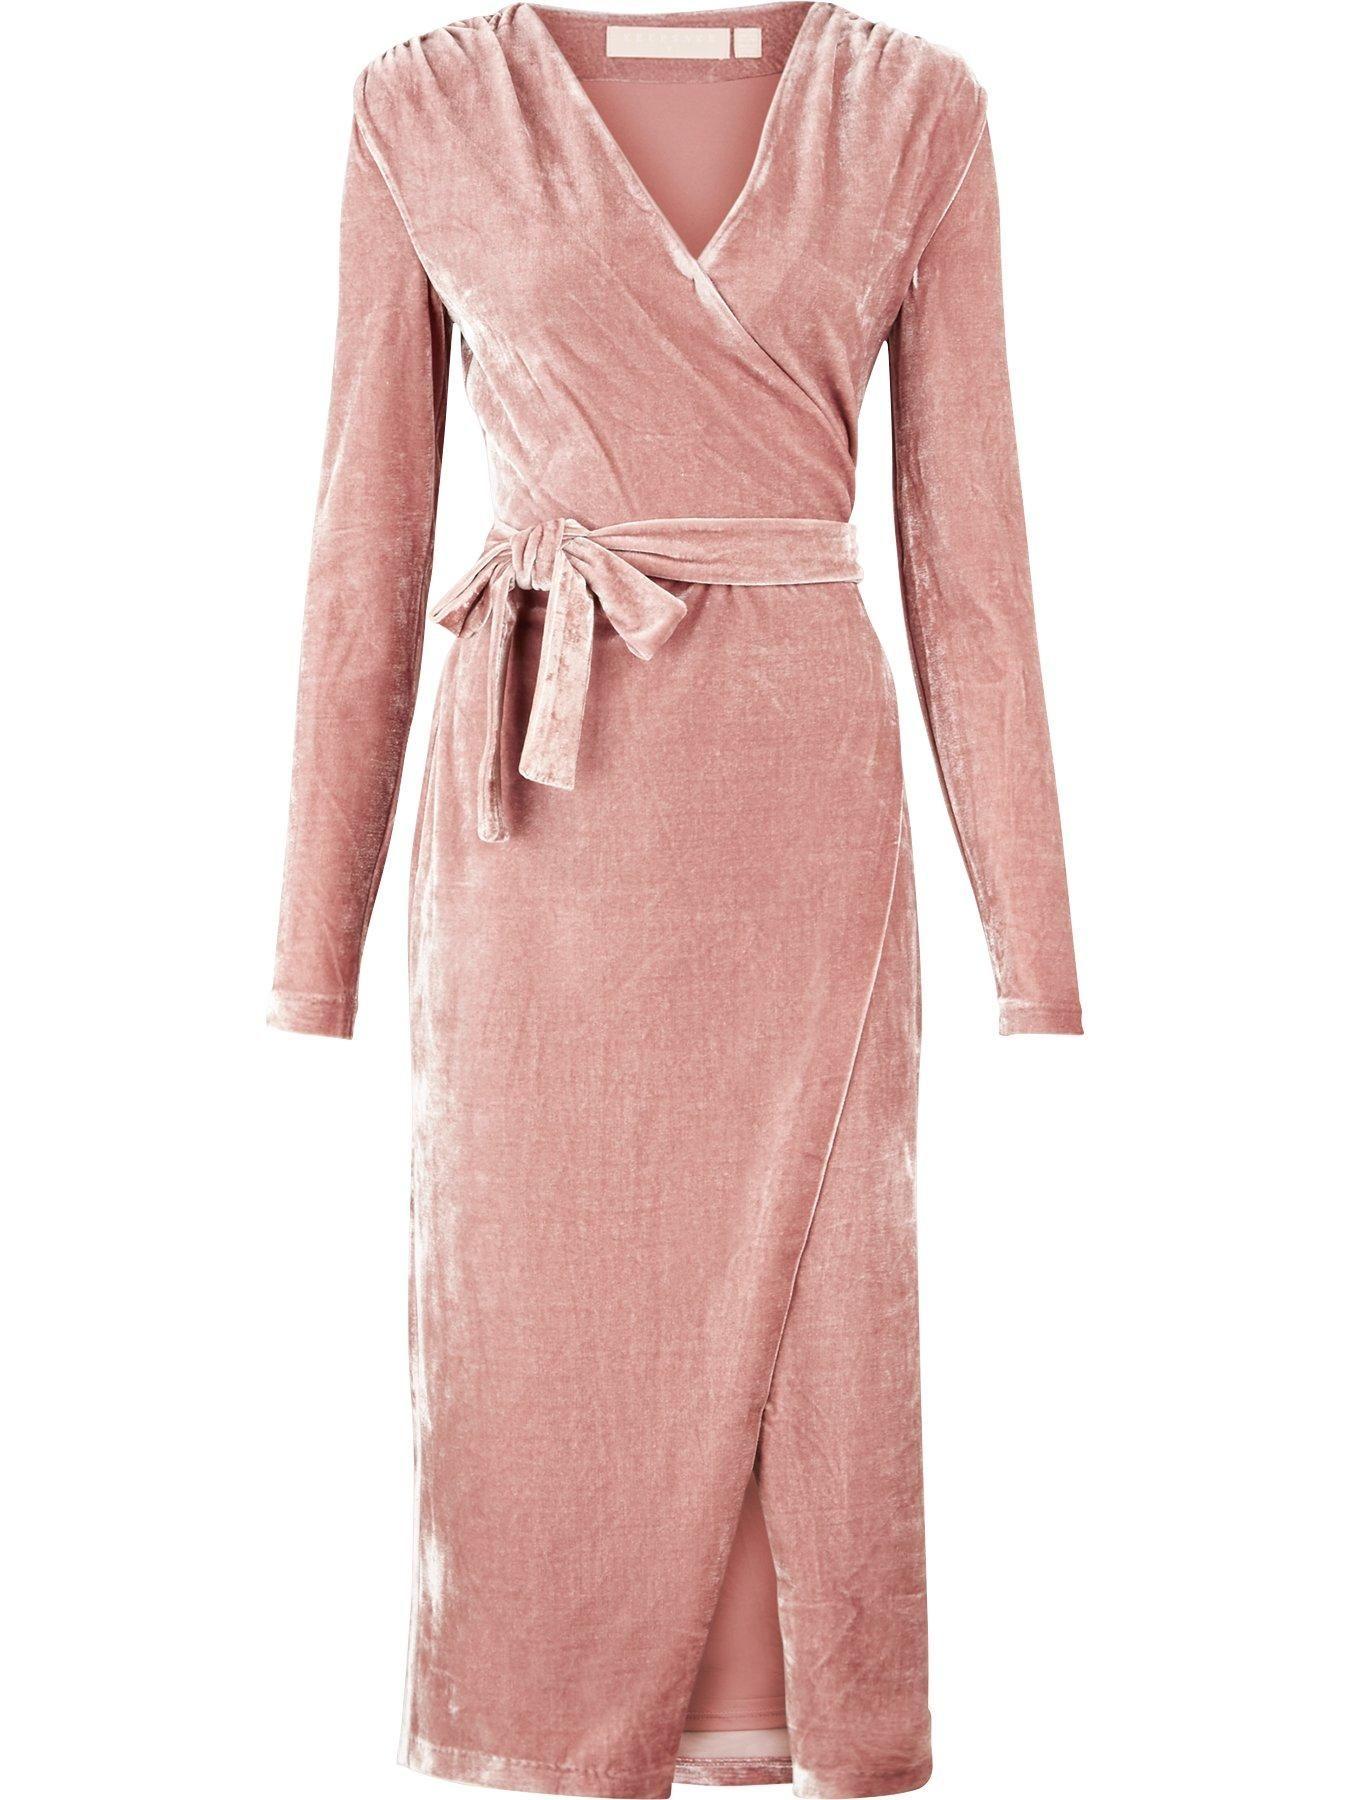 KEEPSAKE Eventually Long Sleeve Velvet Wrap Dress - Pink |  veryexclusive.co.uk